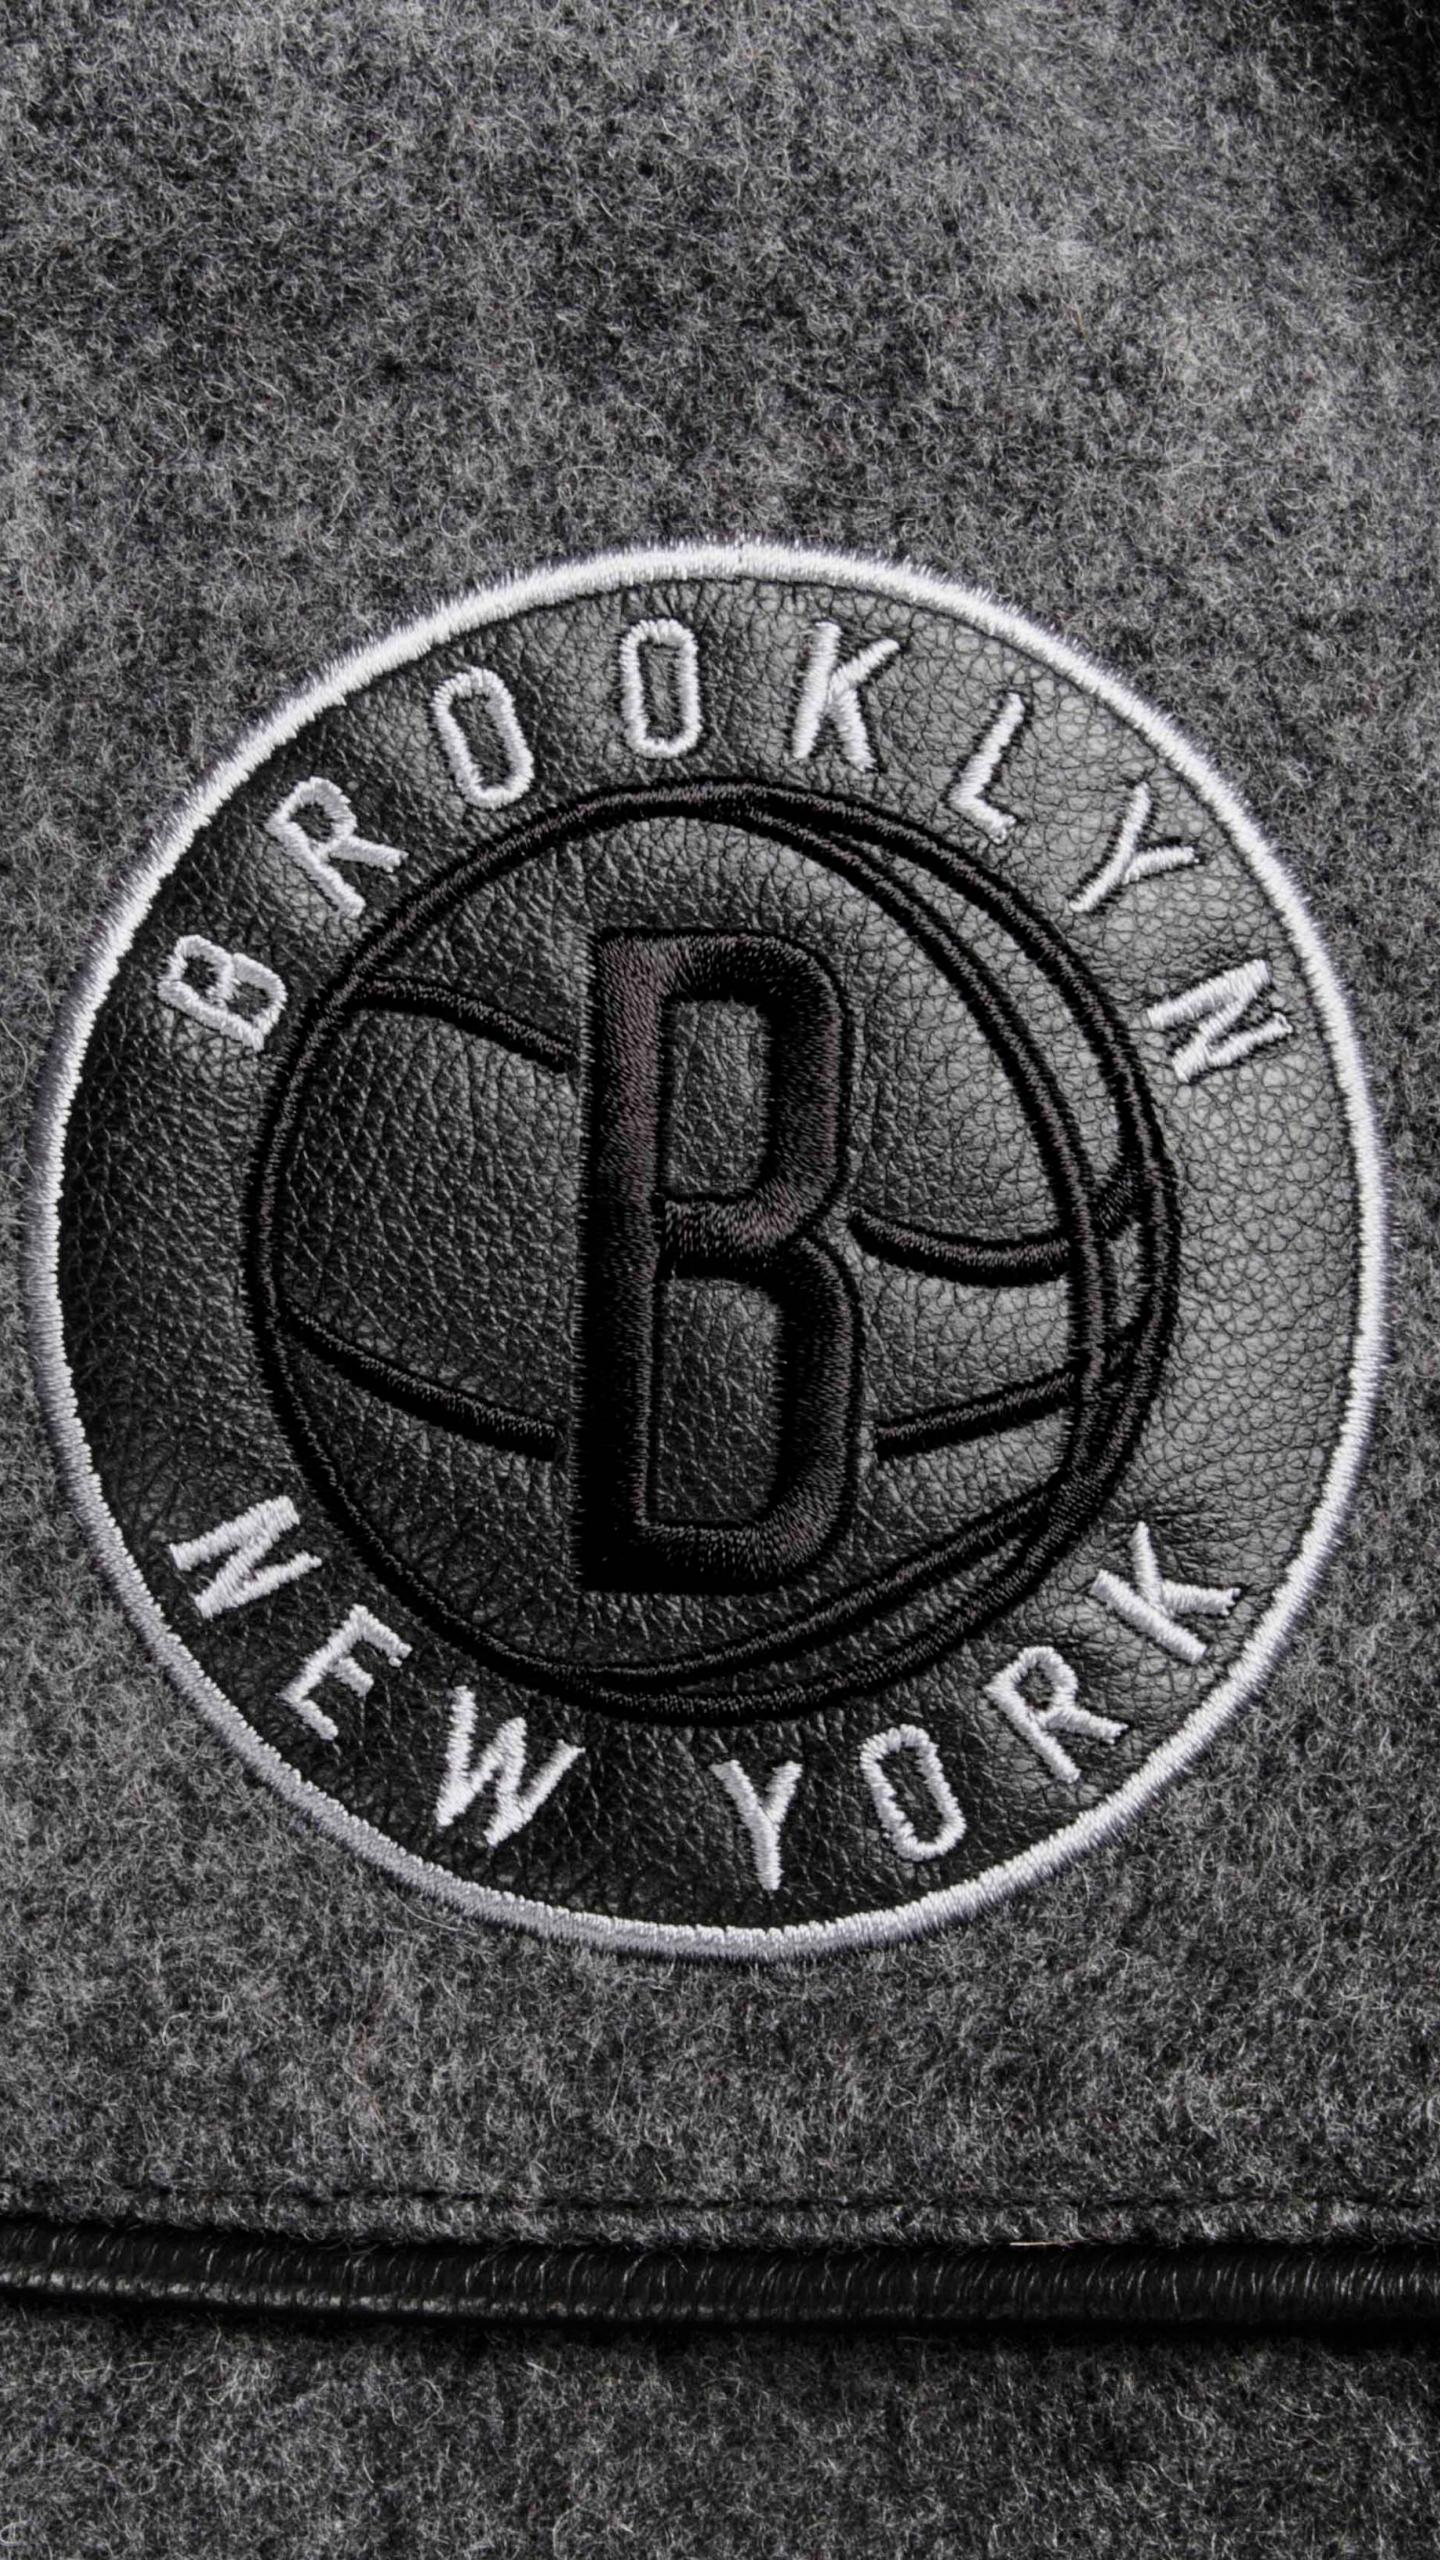 Free Download Brooklyn Nets Nba Basketball 44 Wallpaper